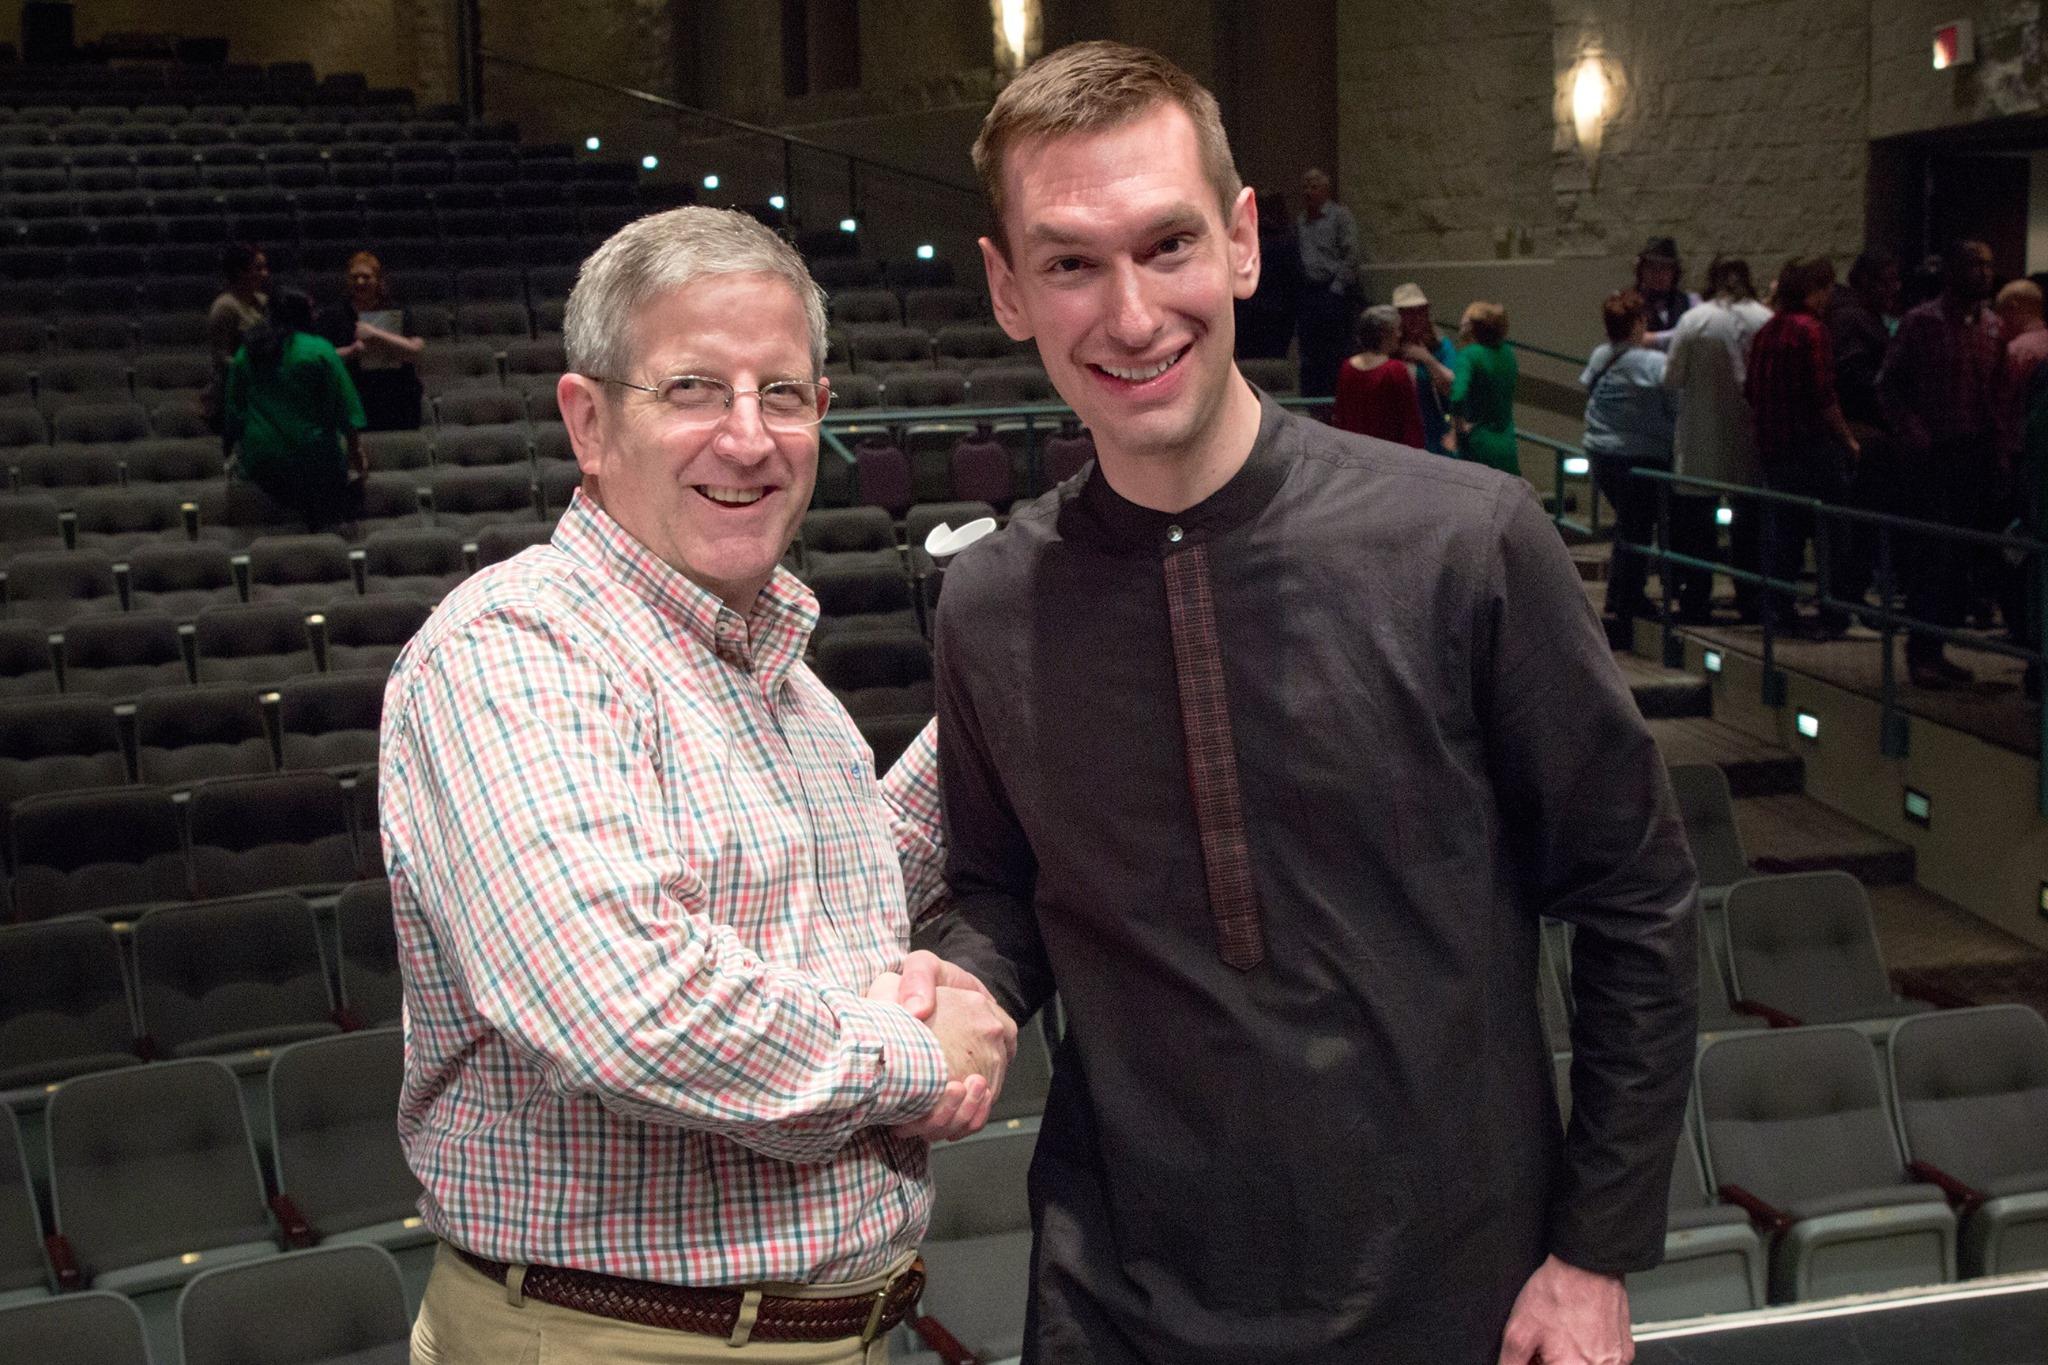 Tim Starnes and Dr. Potter